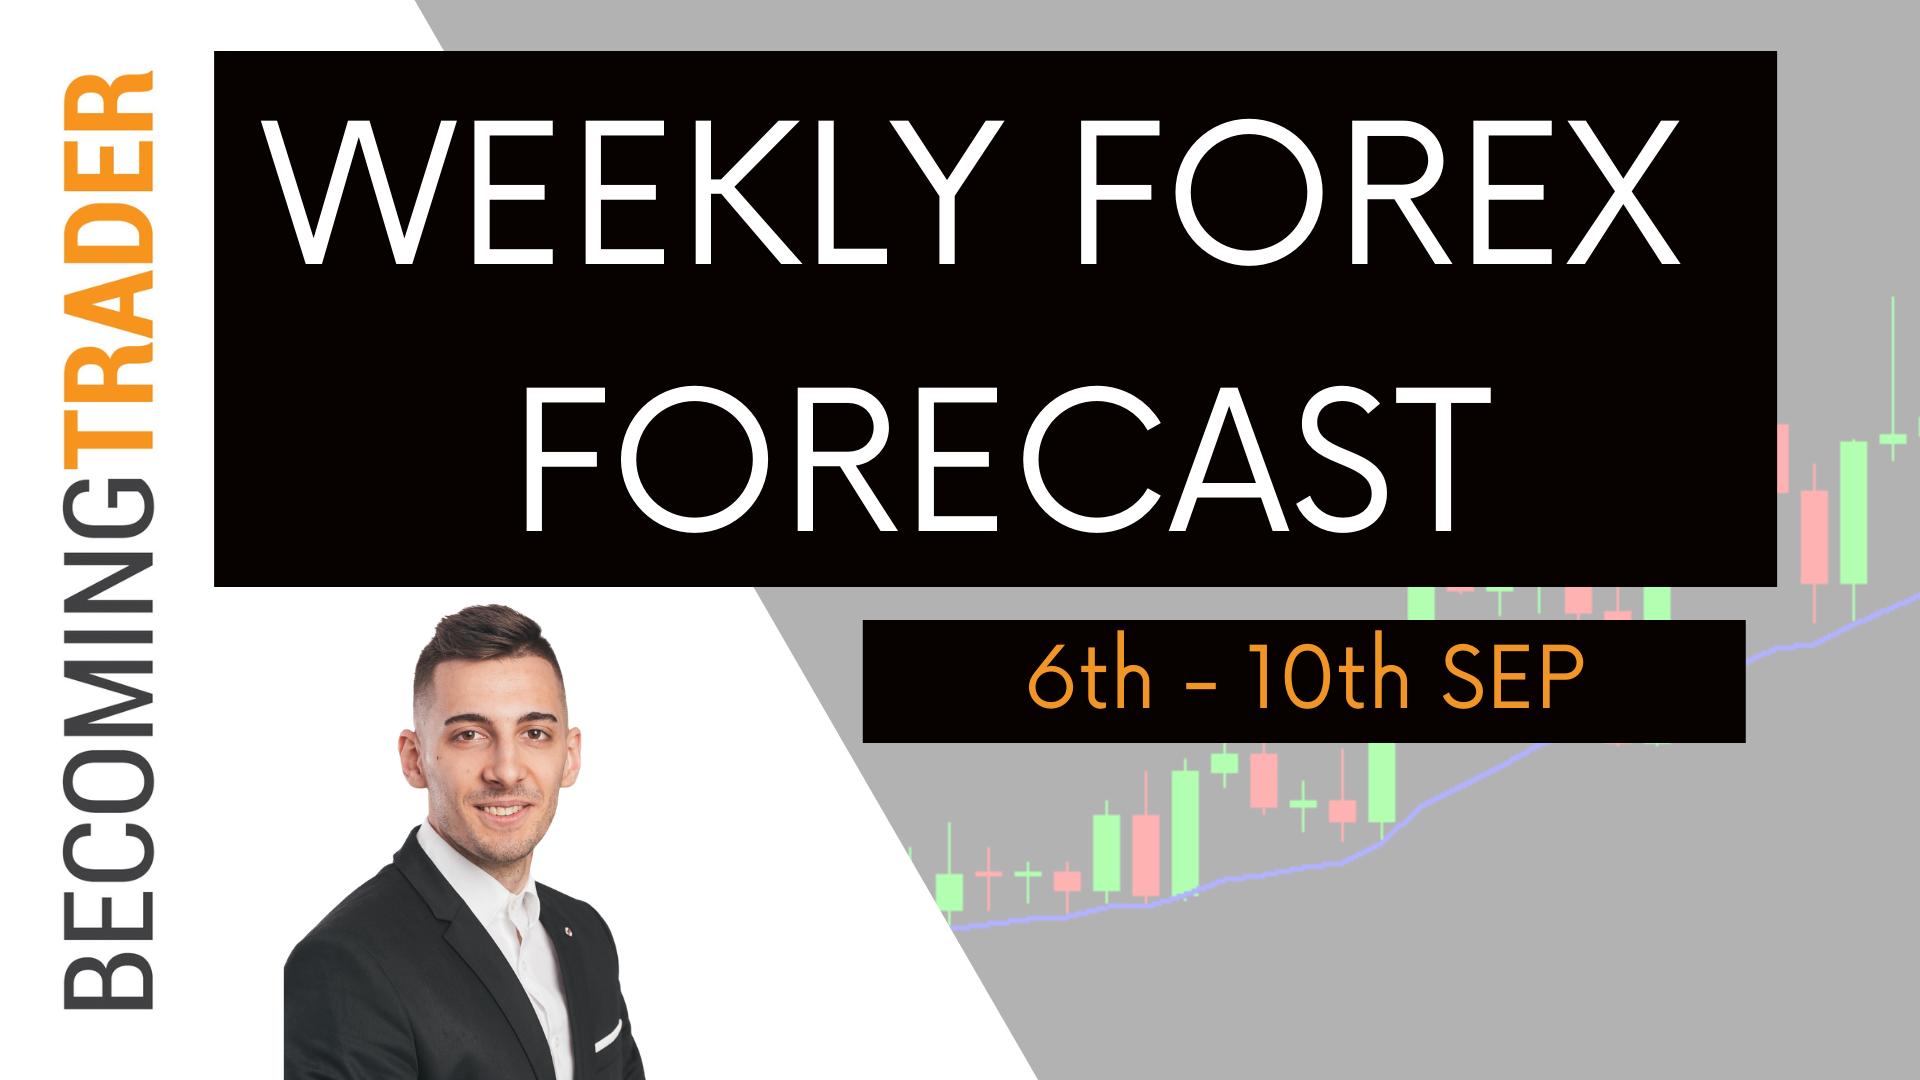 Weekly Forex Forecast 6th to 10th Sep 2021 | EURUSD , GBPUSD , AUDUSD , NZDUSD , USDCAD , USDJPY